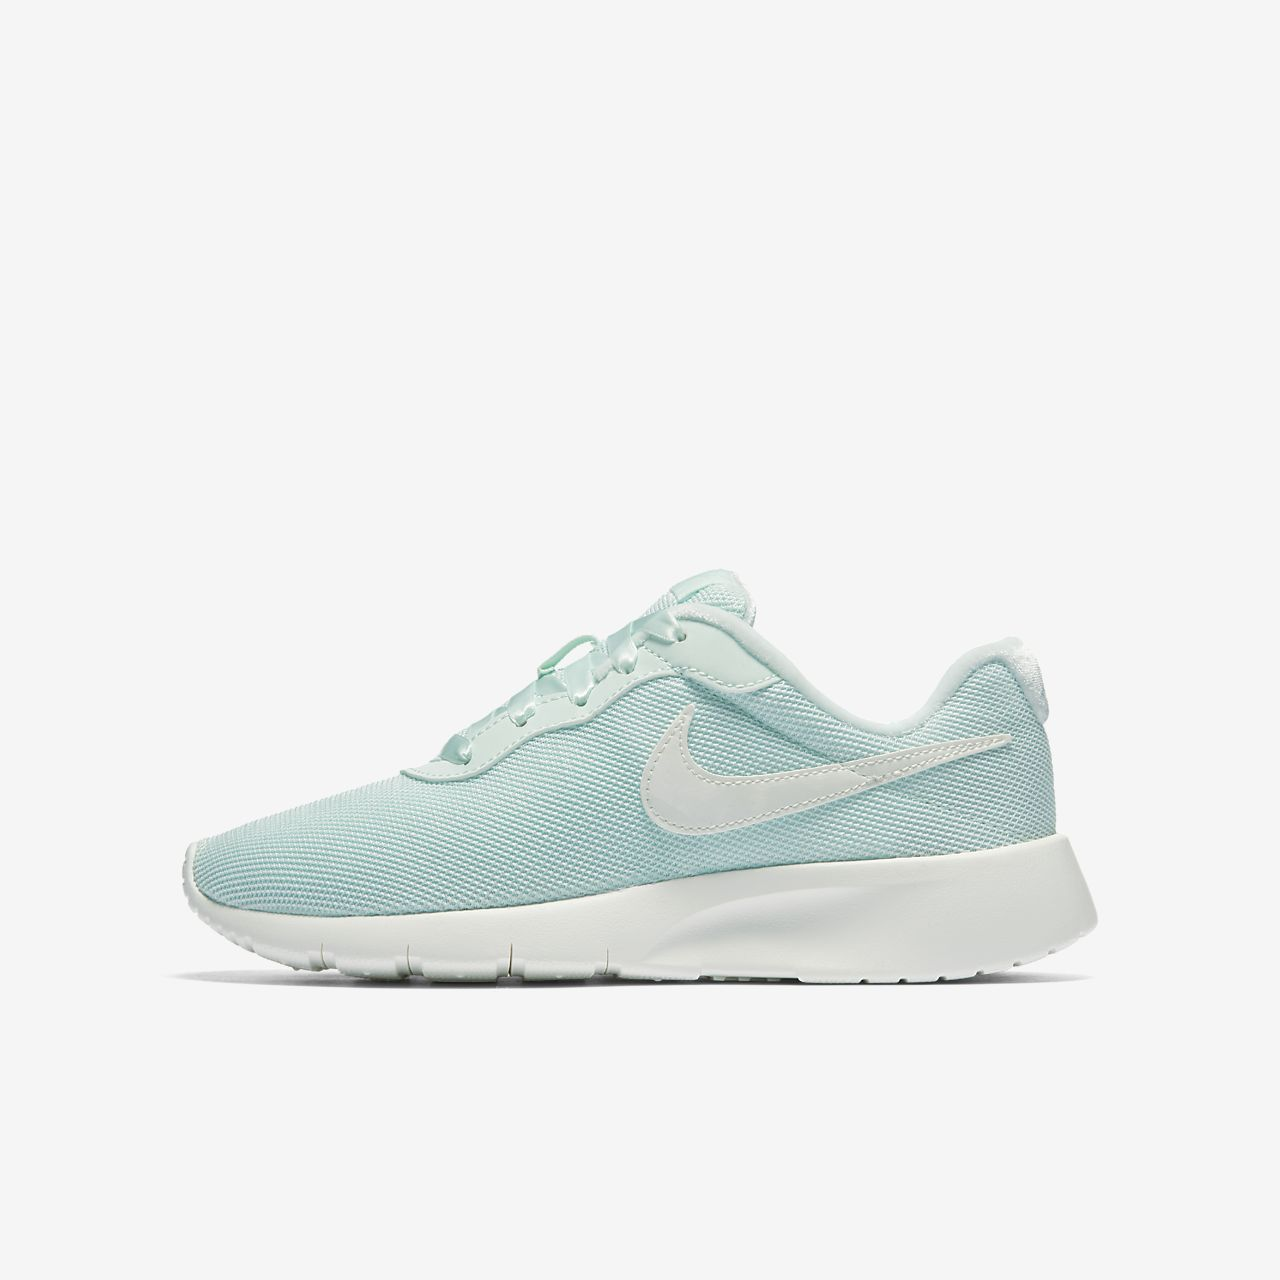 nike tanjun racer aqua blue sneakers nz